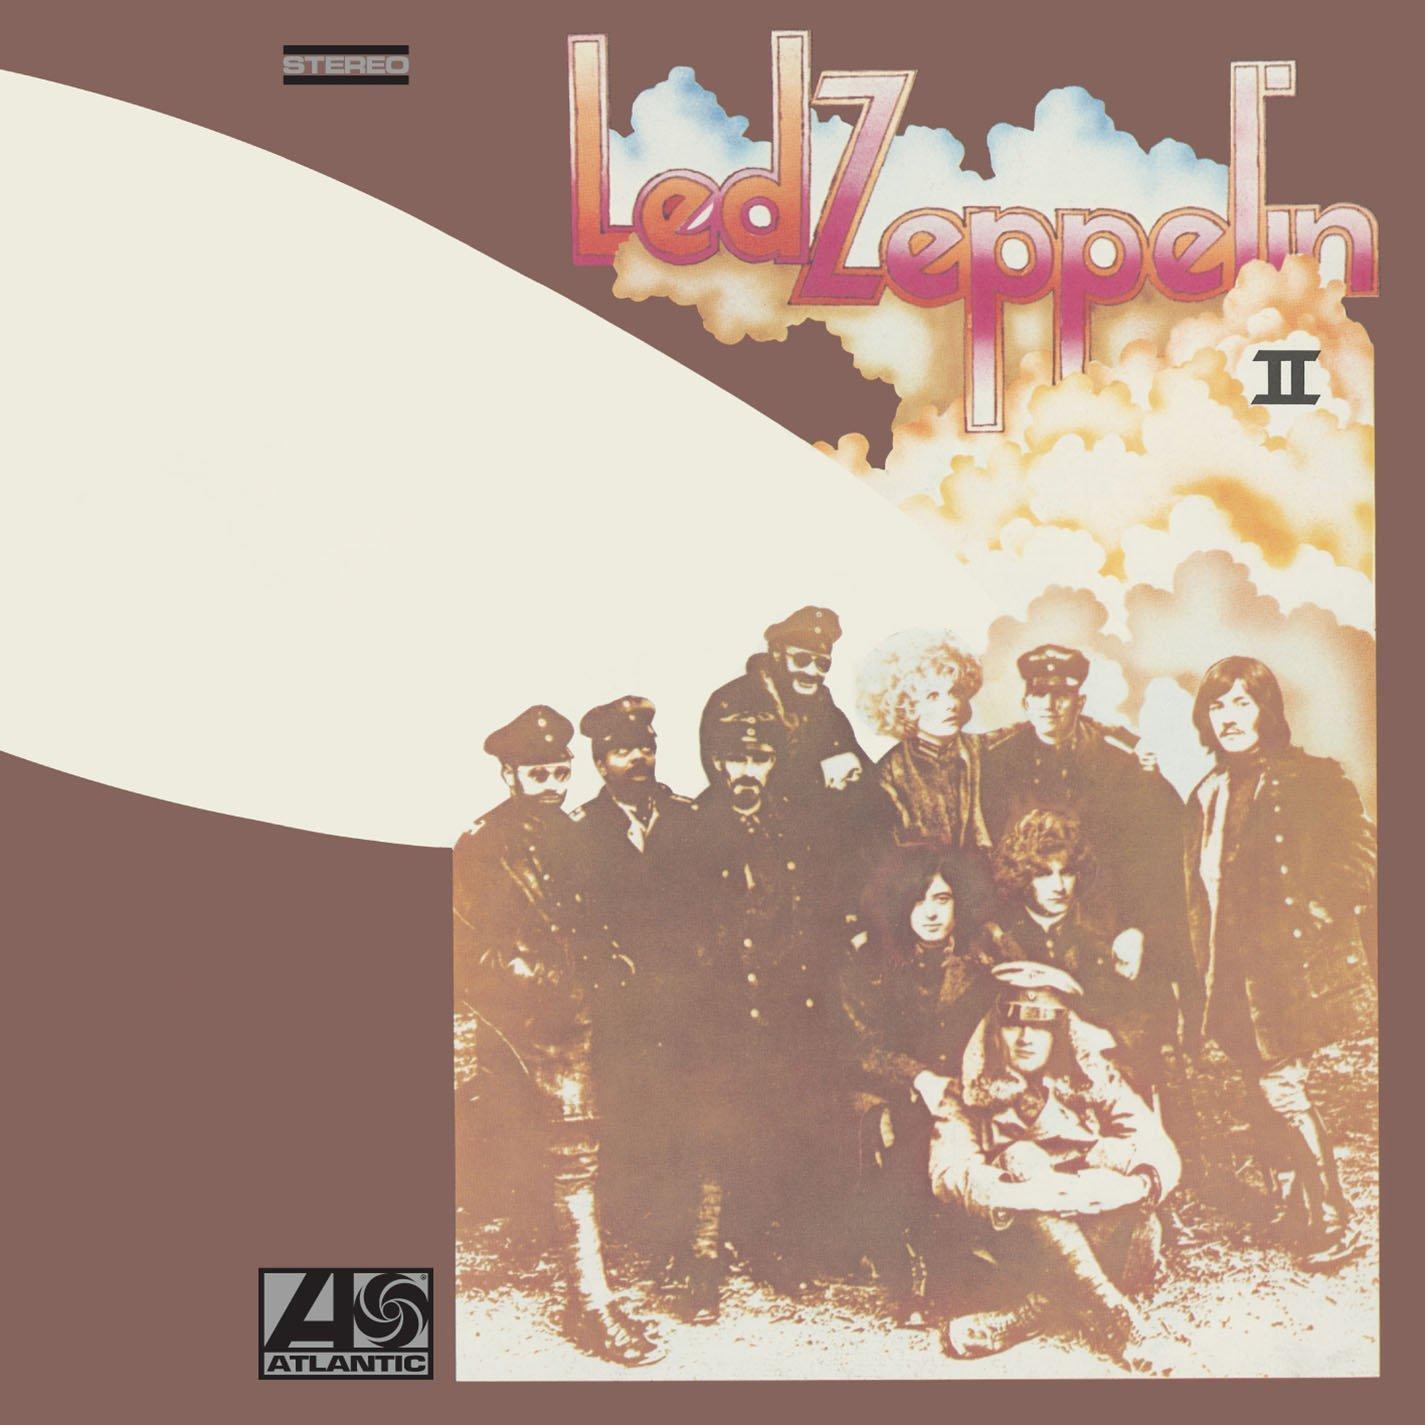 713nx3jpkql  sl1425  CoS Readers Poll Results: Favorite Led Zeppelin Album